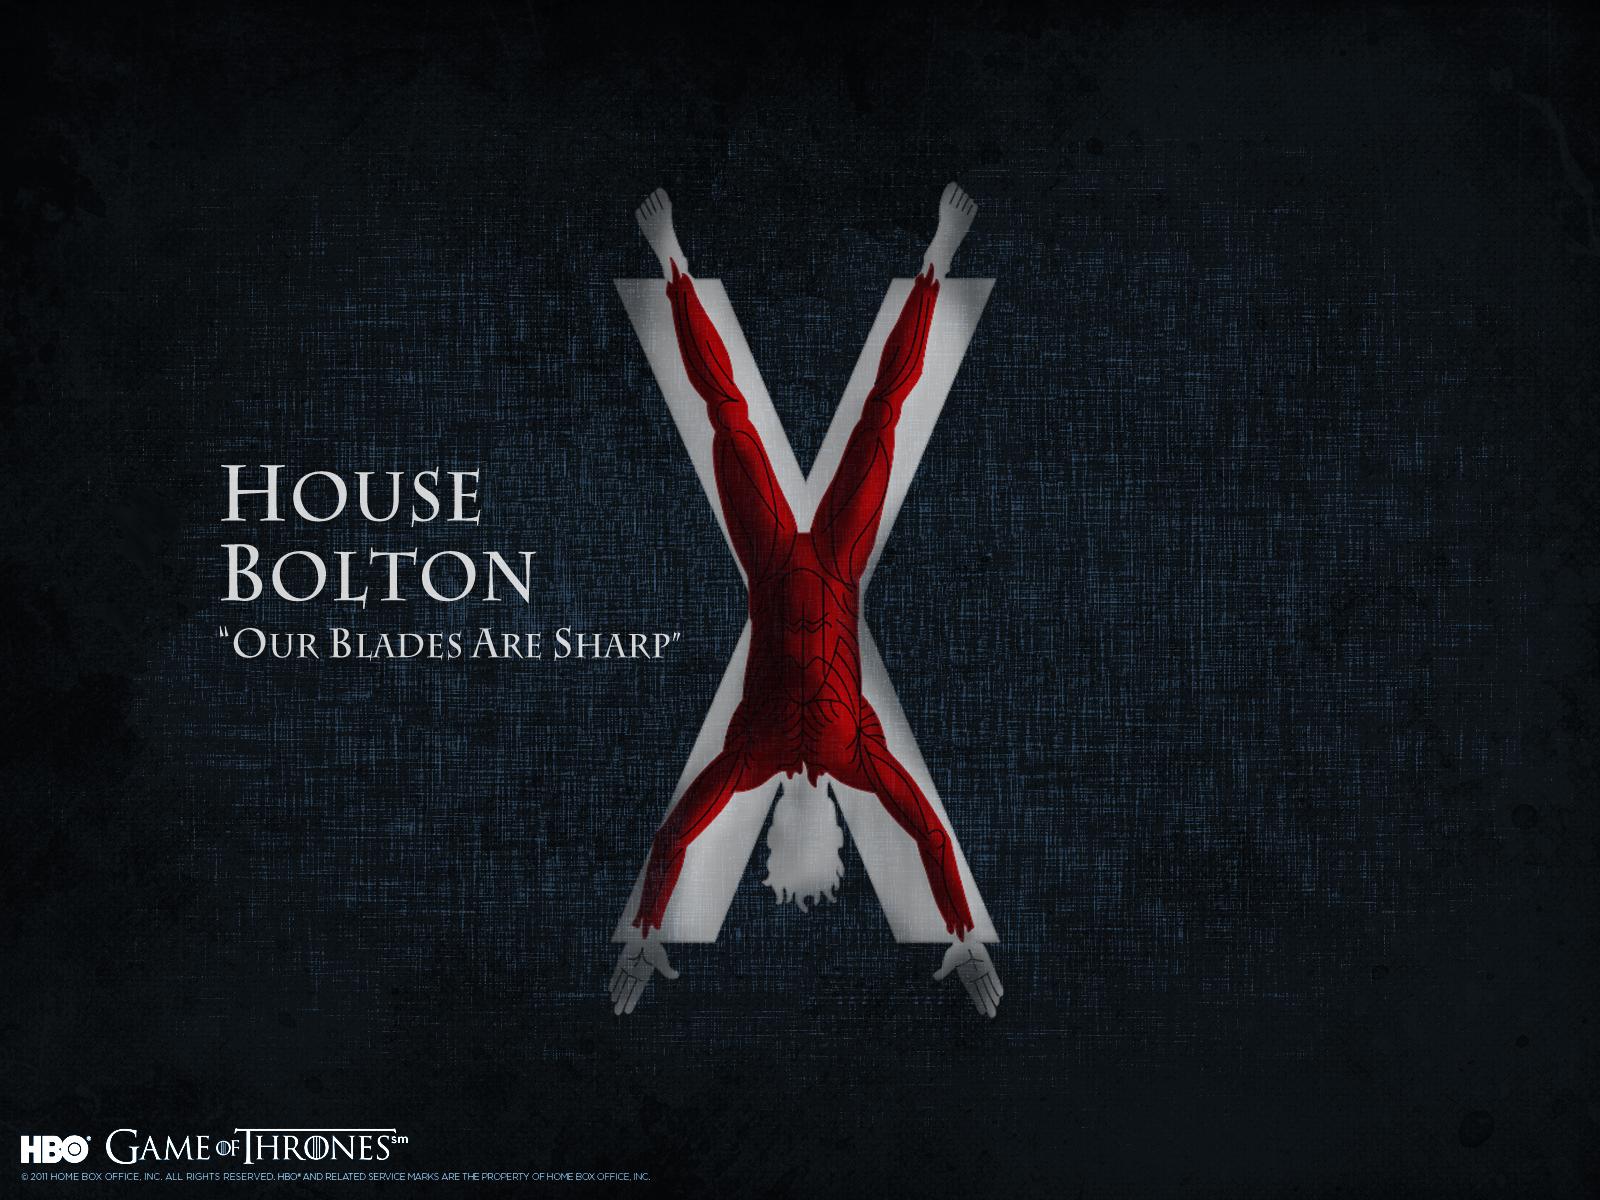 House Bolton